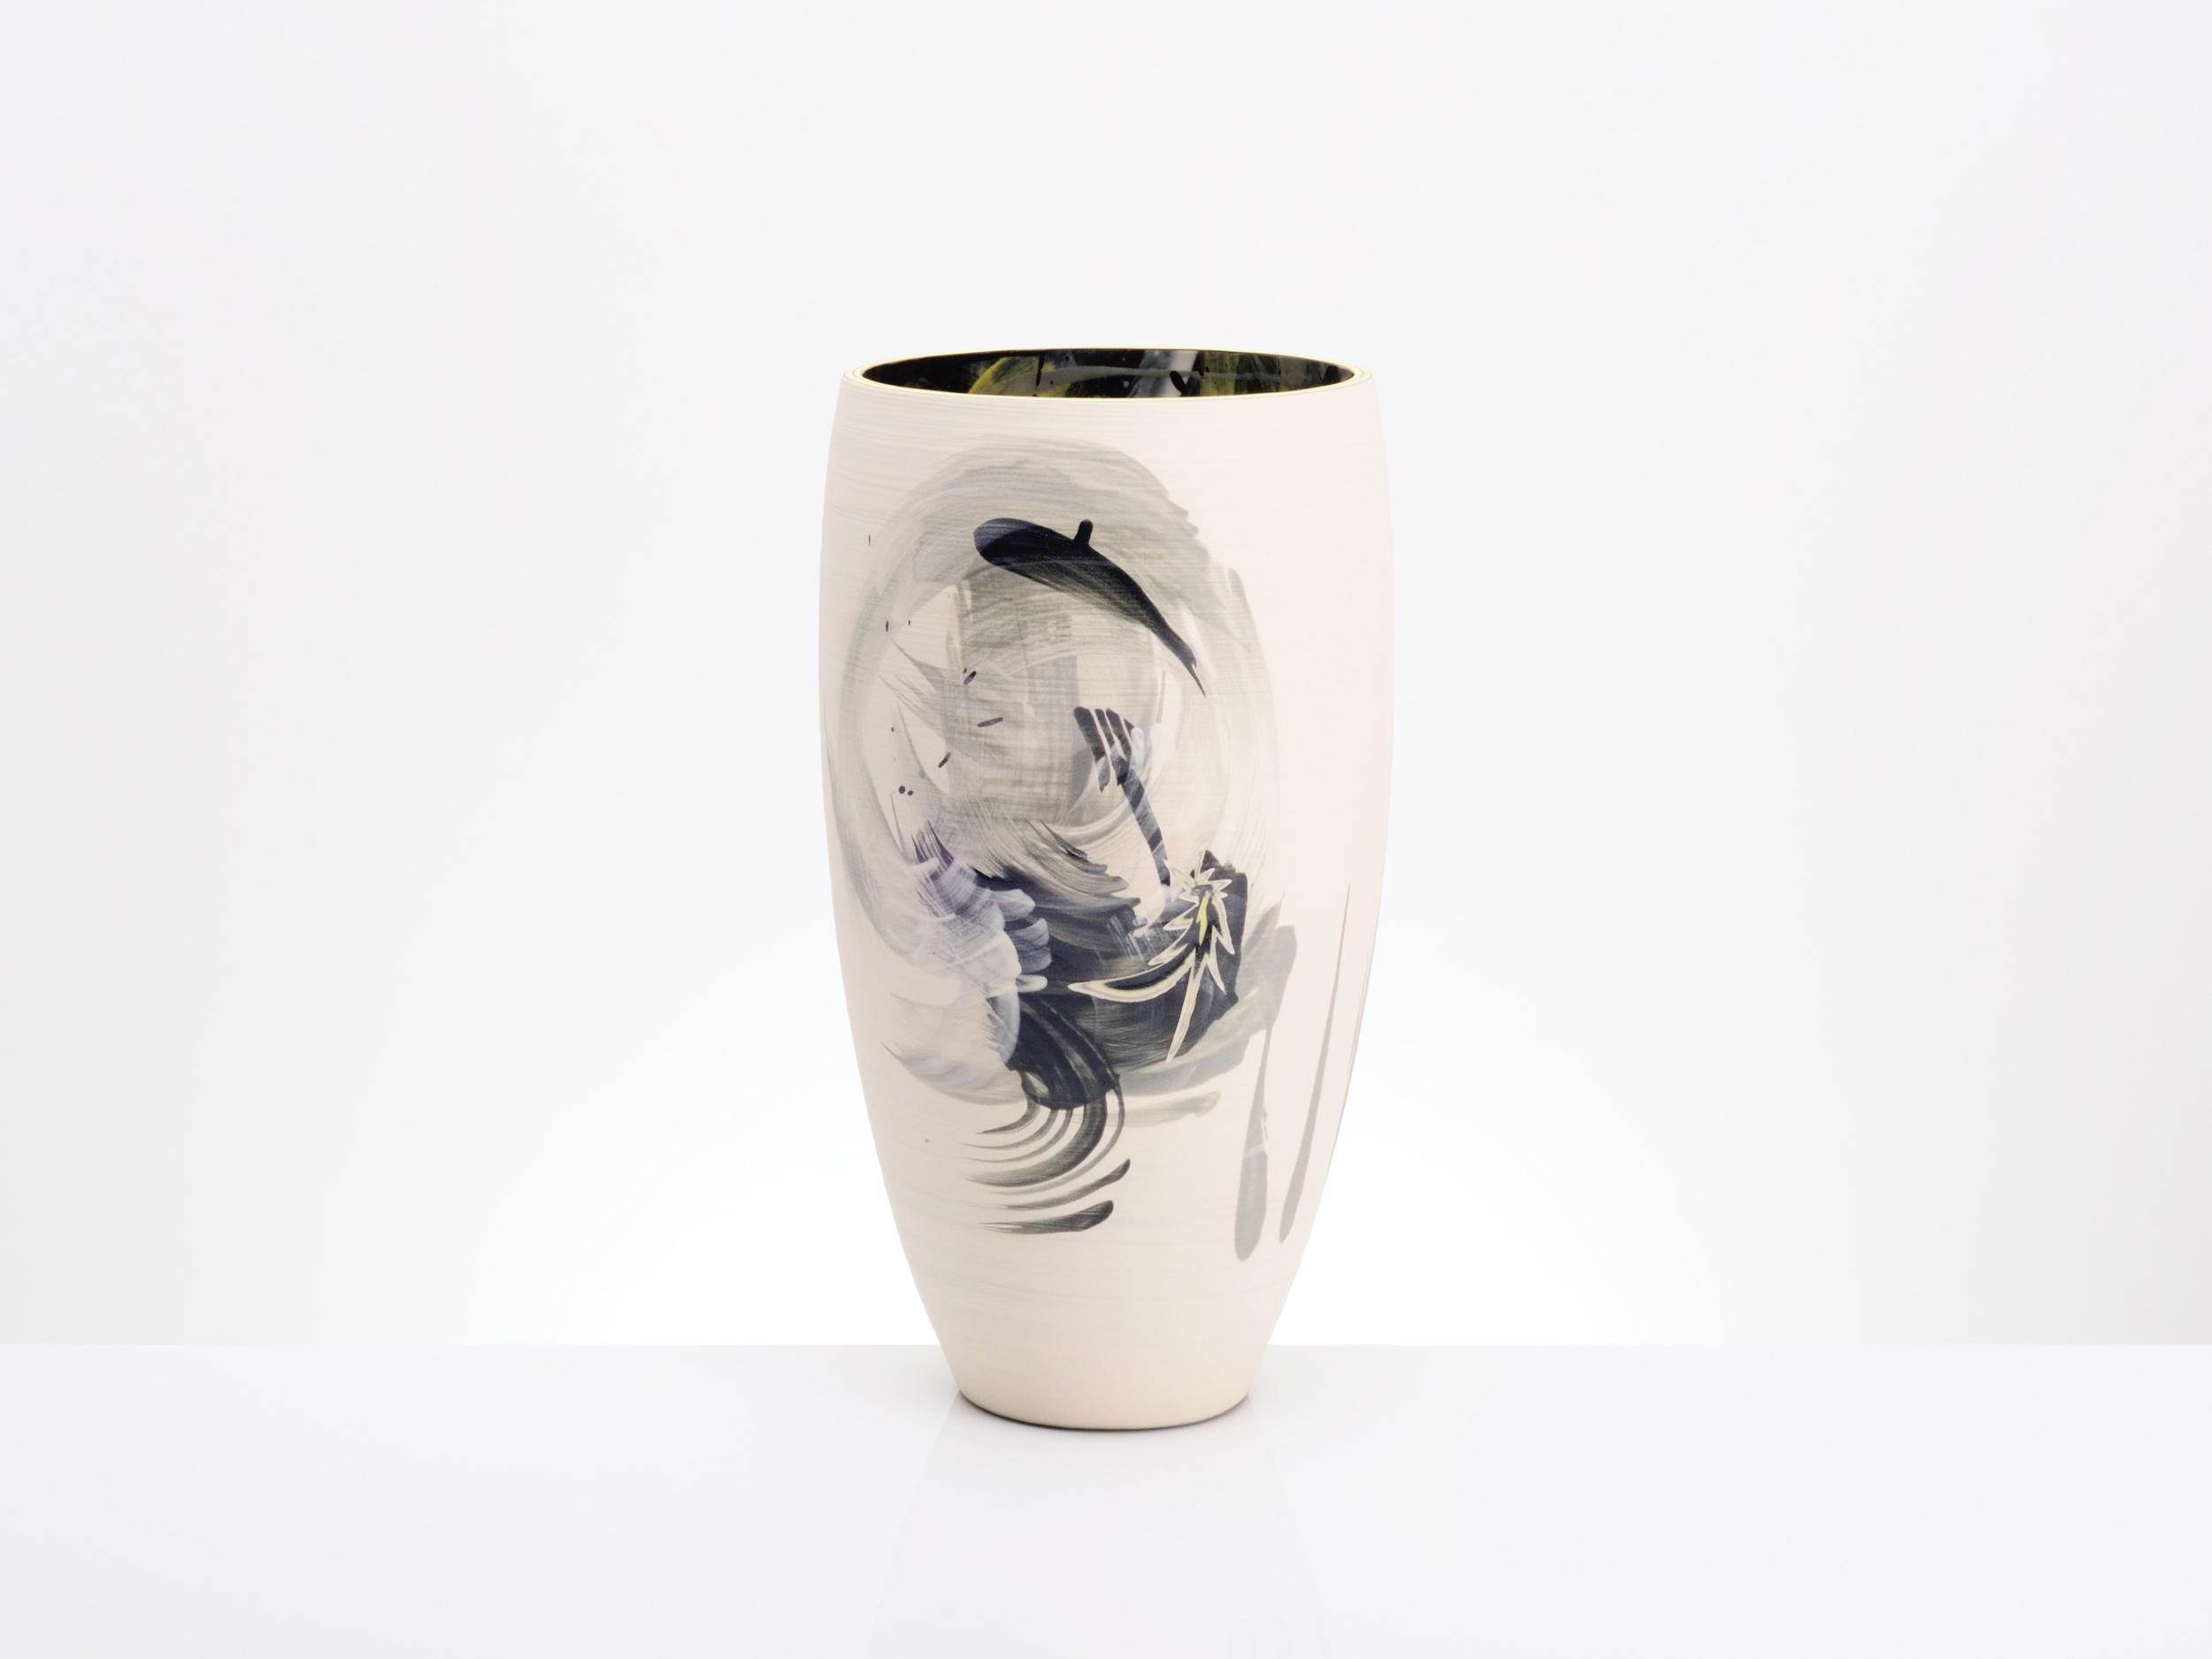 Shooting Star Large Ceramic Vase by Rowena Gilbert